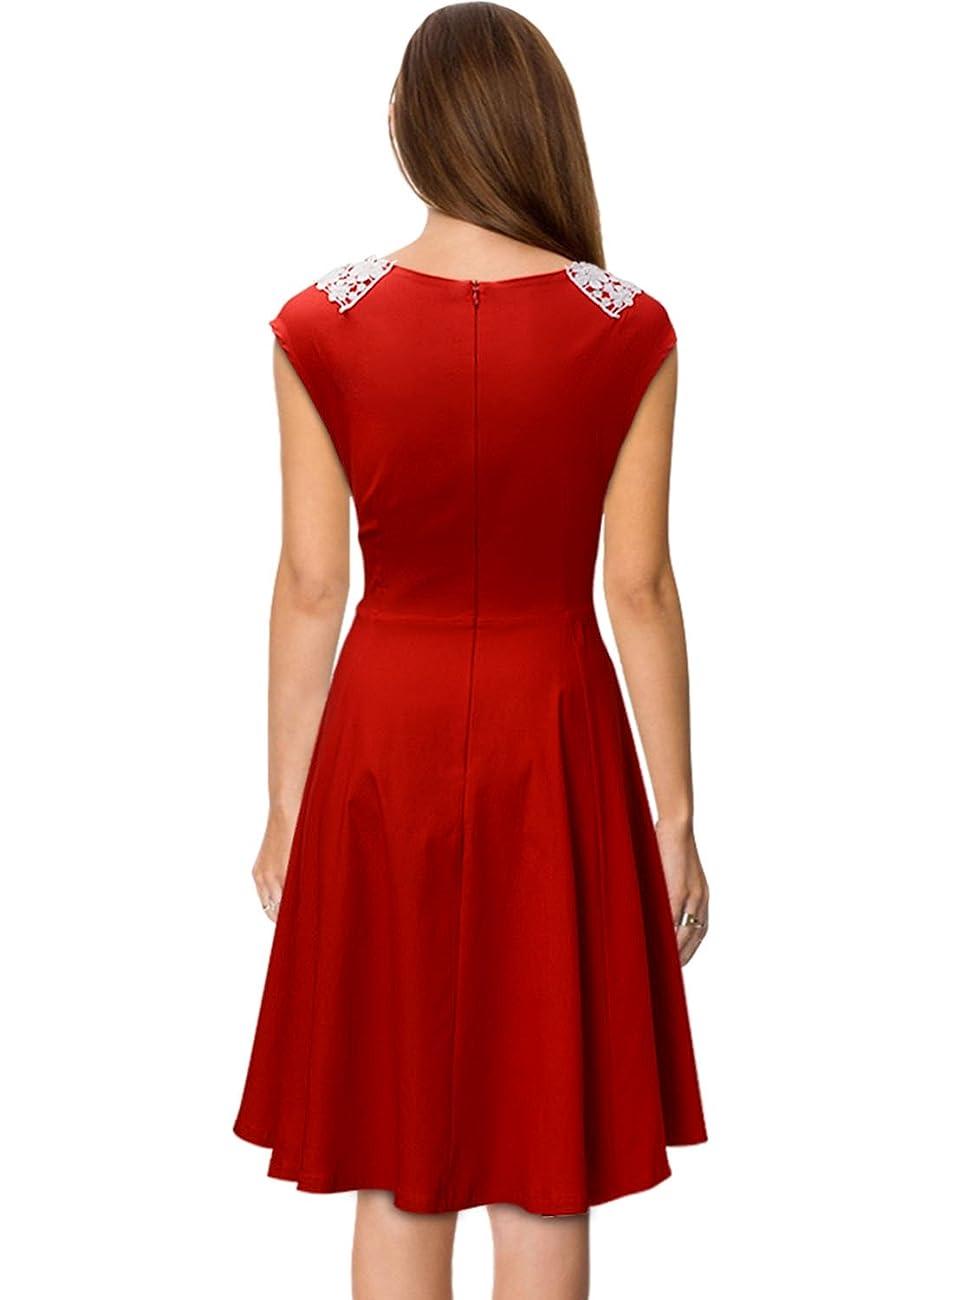 Miusol Women's Classy Vintage Audrey Hepburn Style 1940's Rockabilly Evening Dress 1